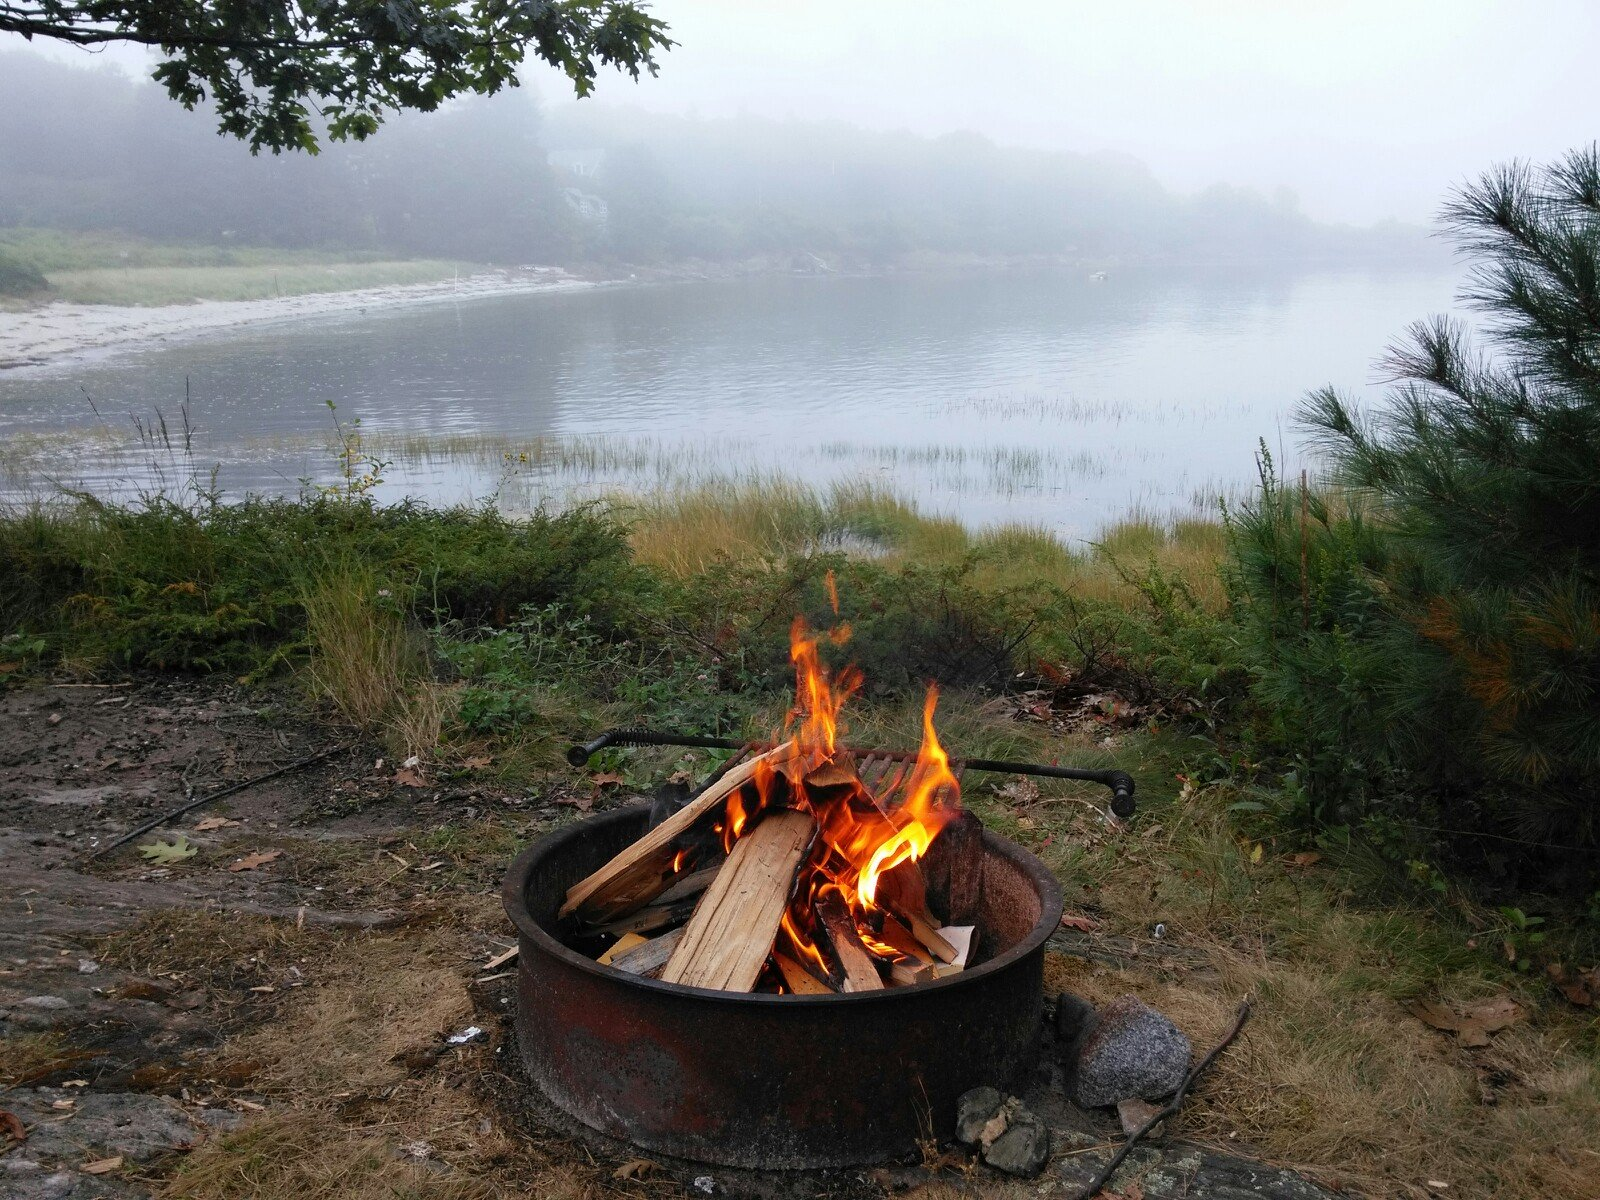 campground sagadahoc bay maine georgetown camping campgrounds button campmaine tripadvisor